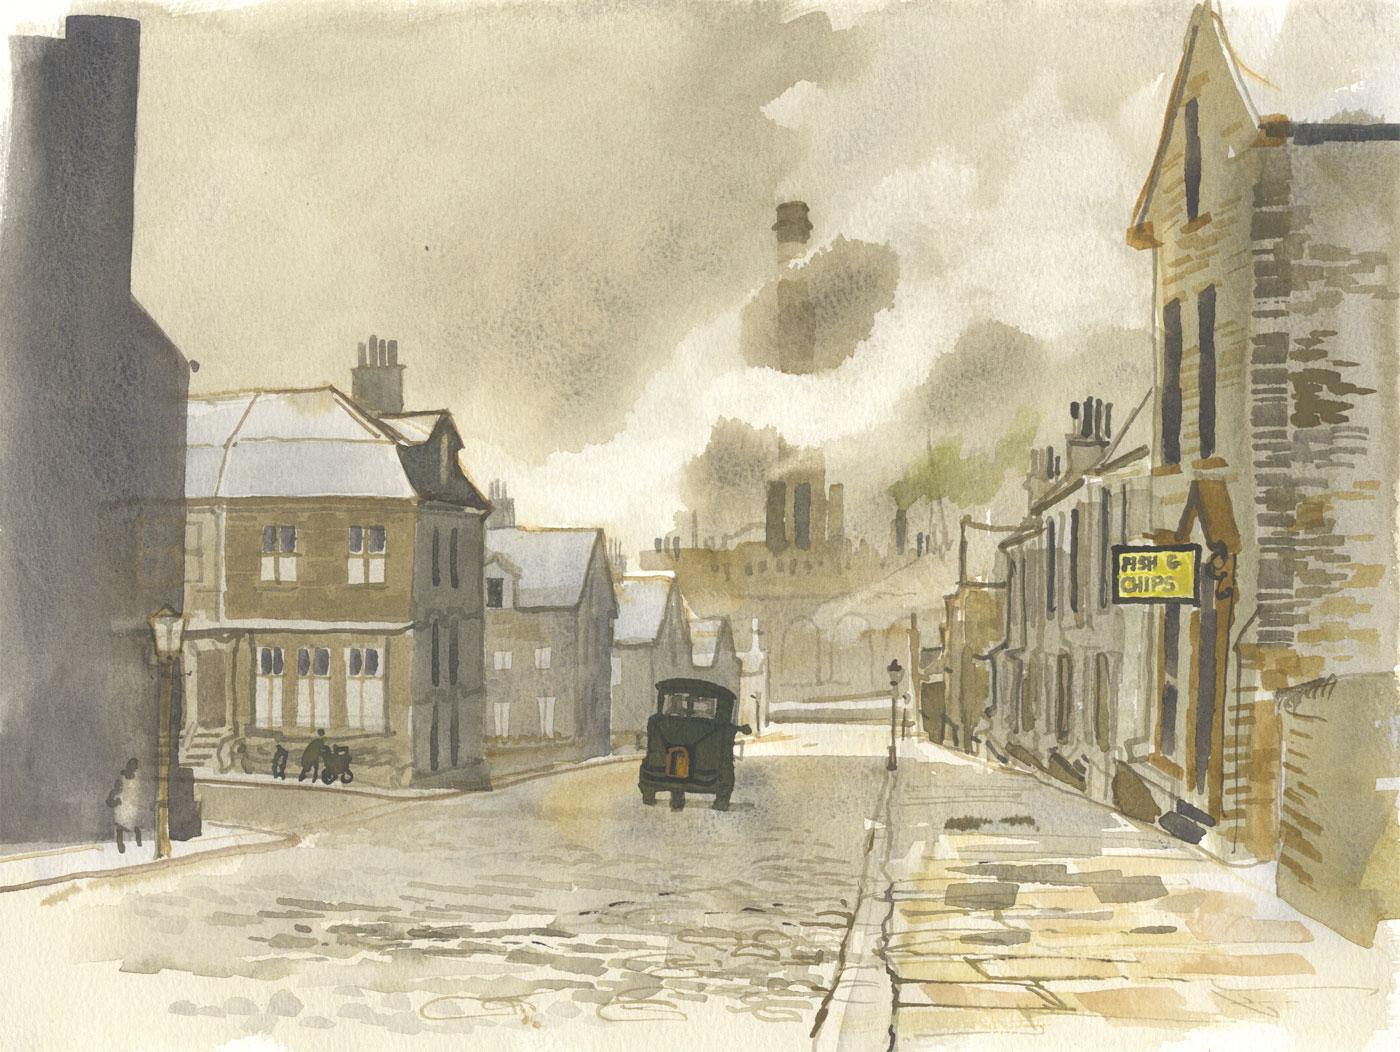 Robert T. Blayney (1929-2016) - Mid 20th Century Watercolour, Town Street